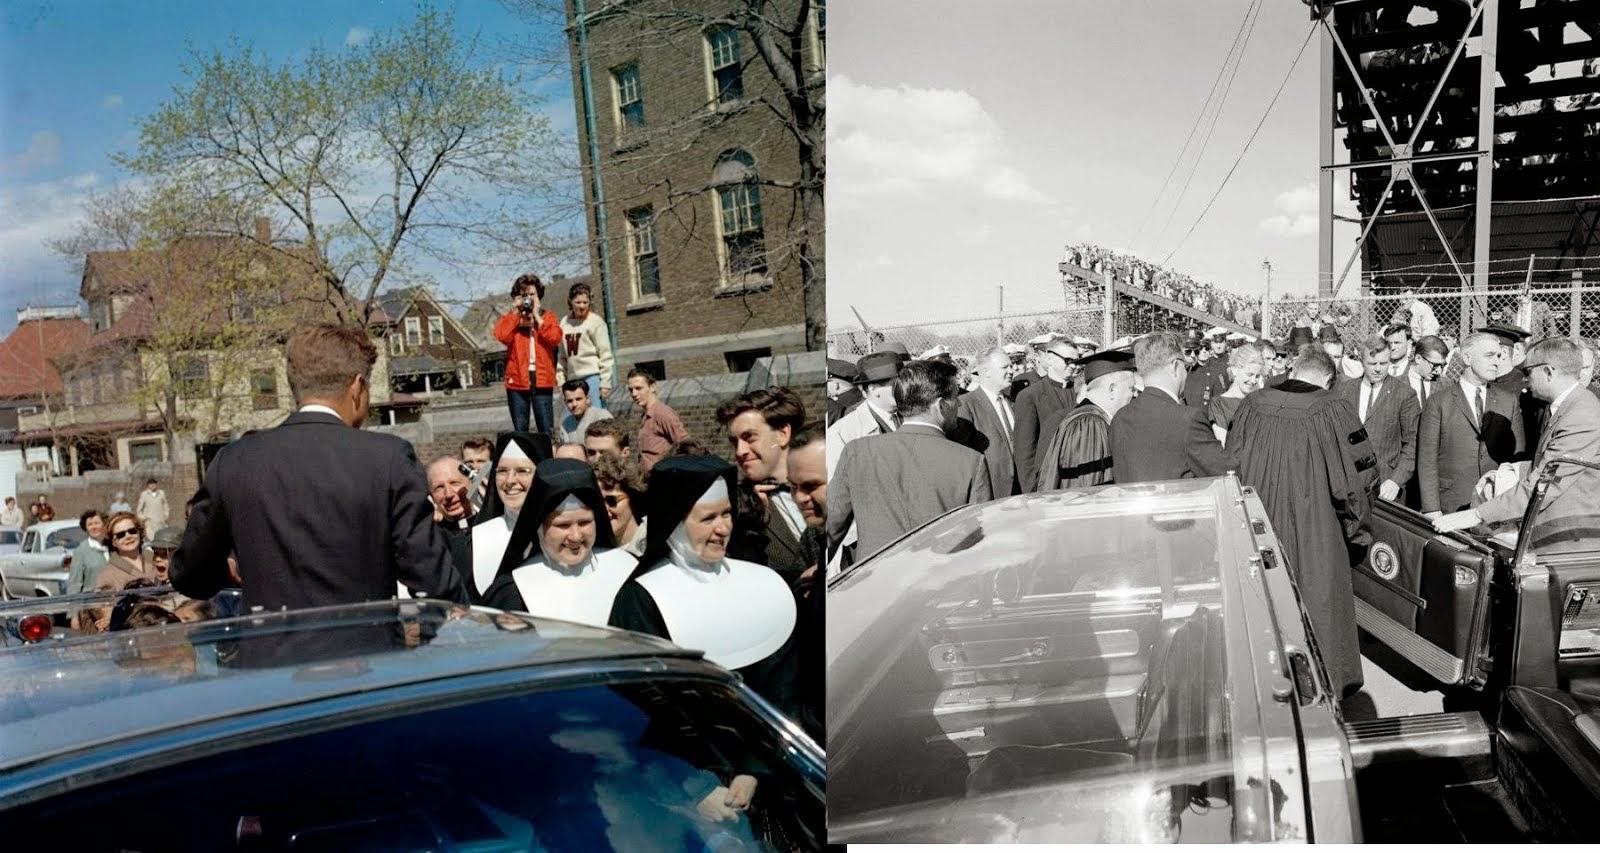 JFK bubbletop Boston, MA 4/20/63